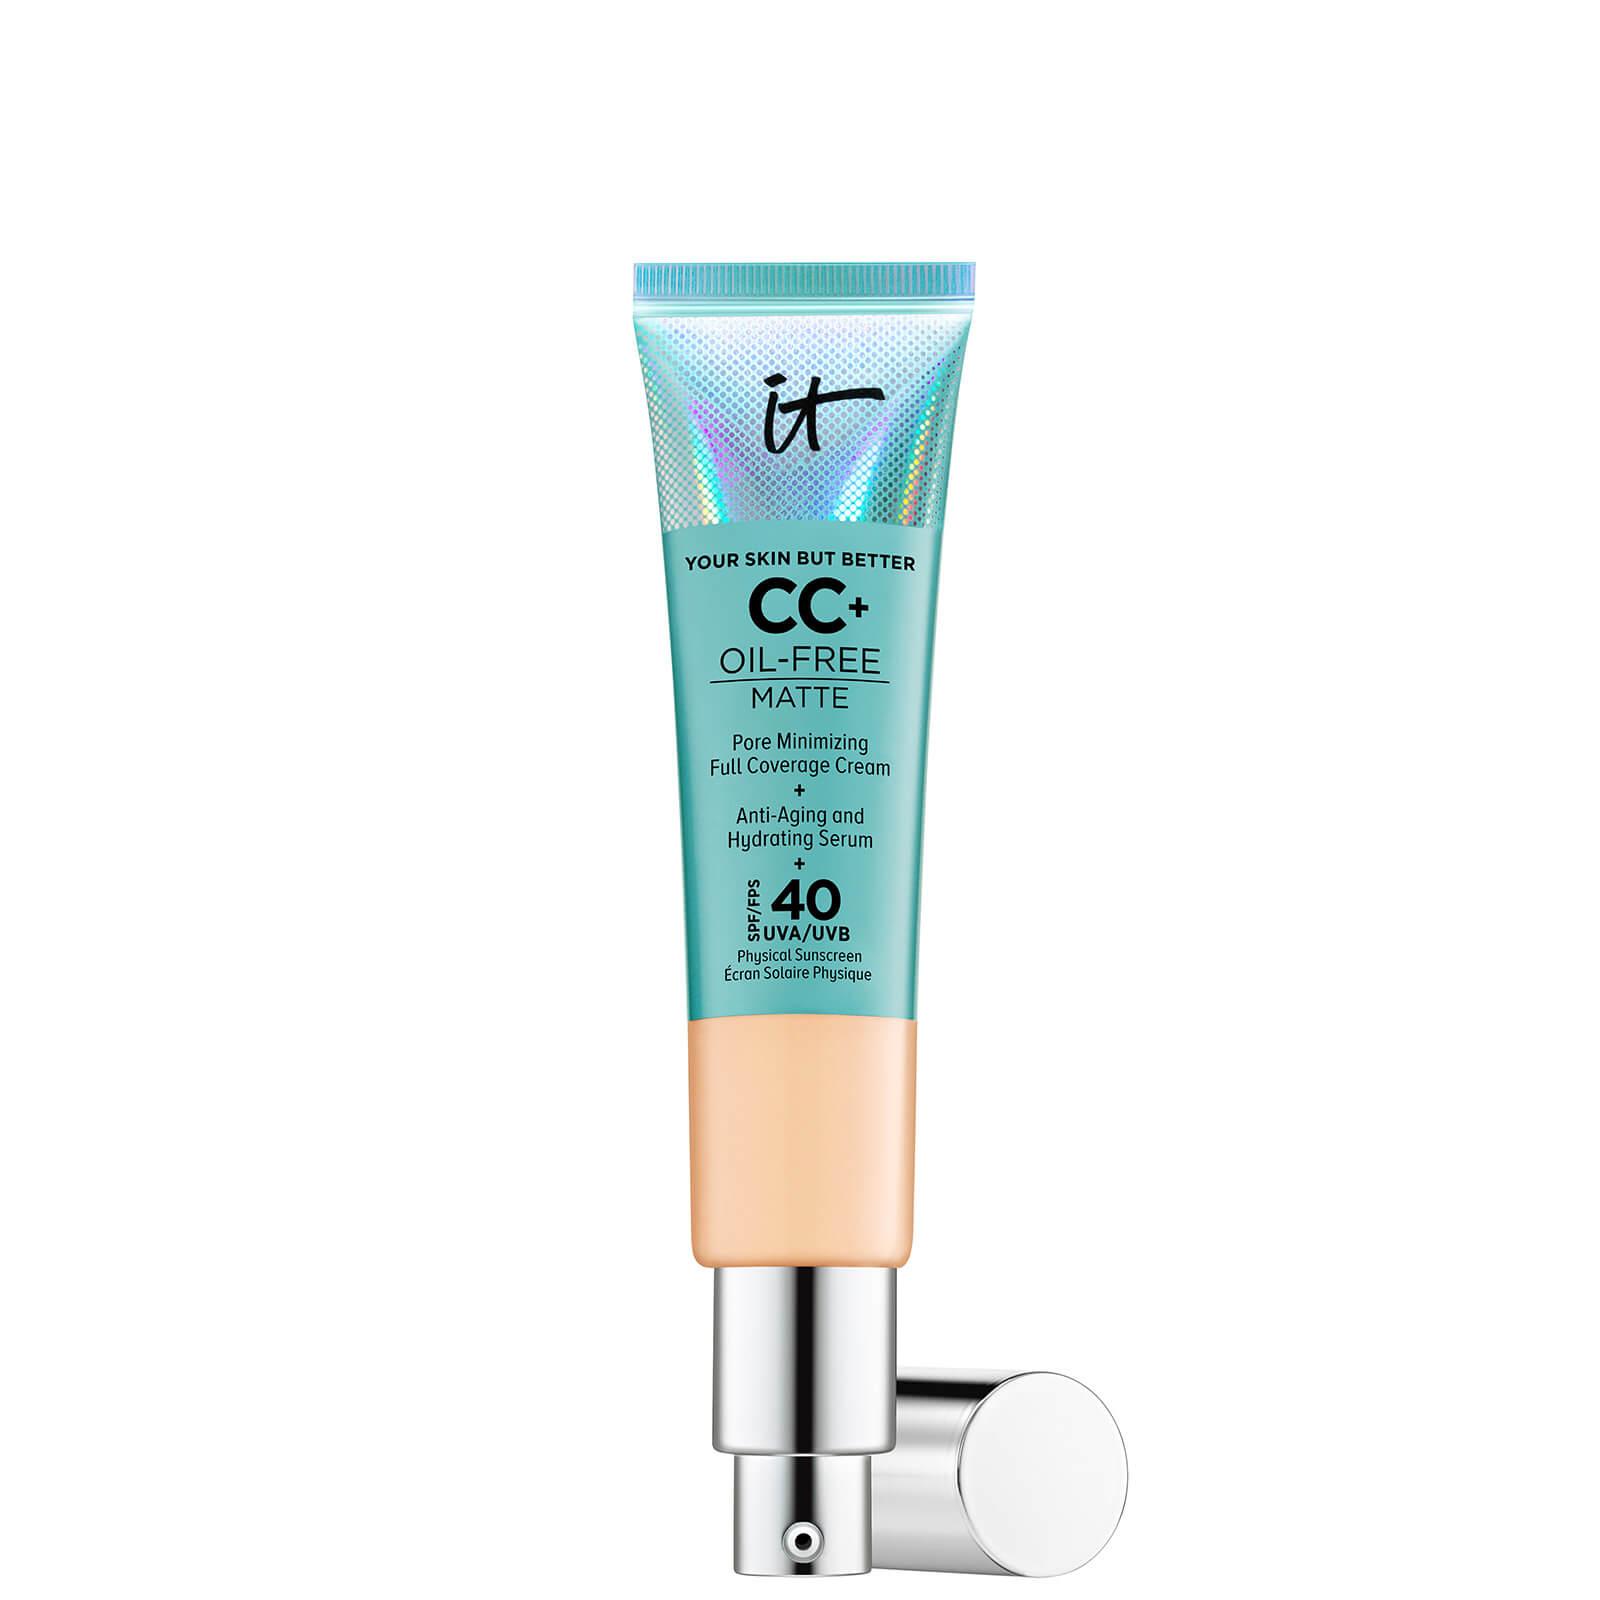 Купить IT Cosmetics Your Skin But Better CC+ Oil-Free Matte SPF40 32ml (Various Shades) - Medium